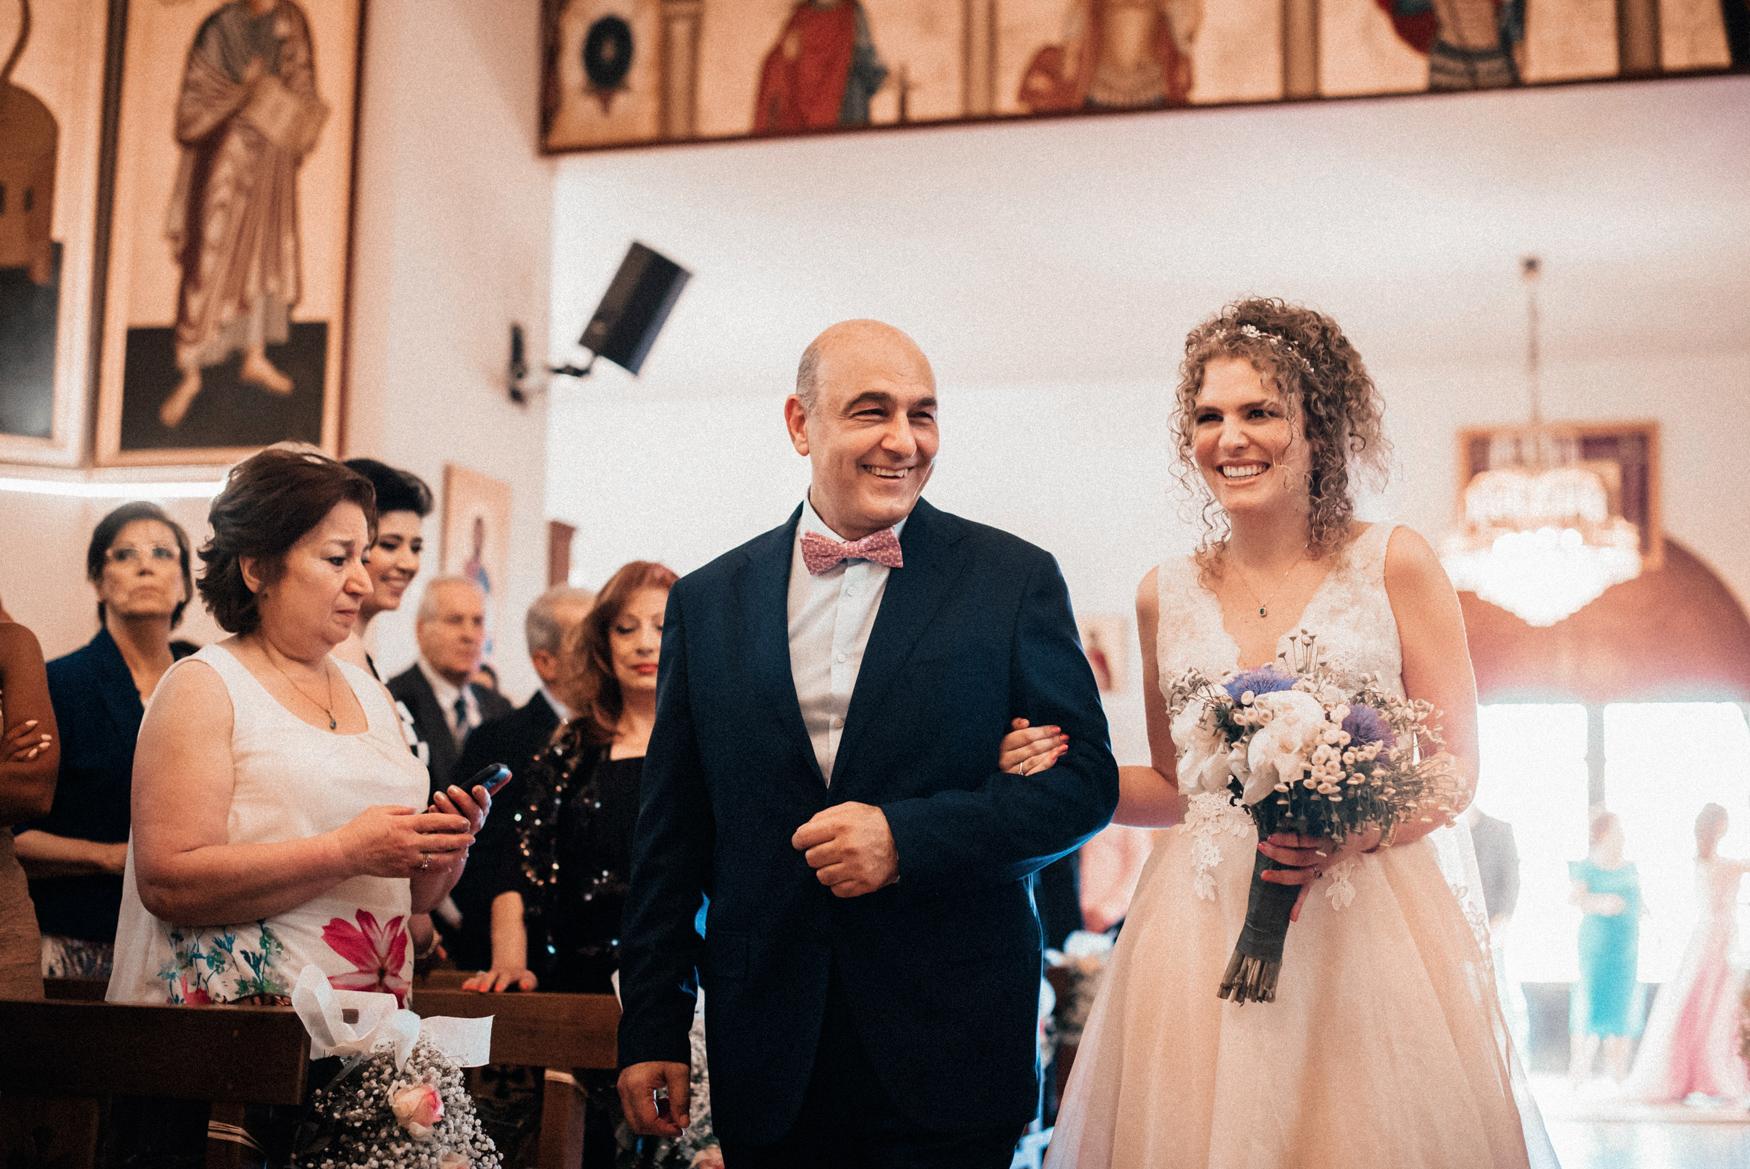 LR3 byblos beirut church wedding ceremony lebanon 003.jpg